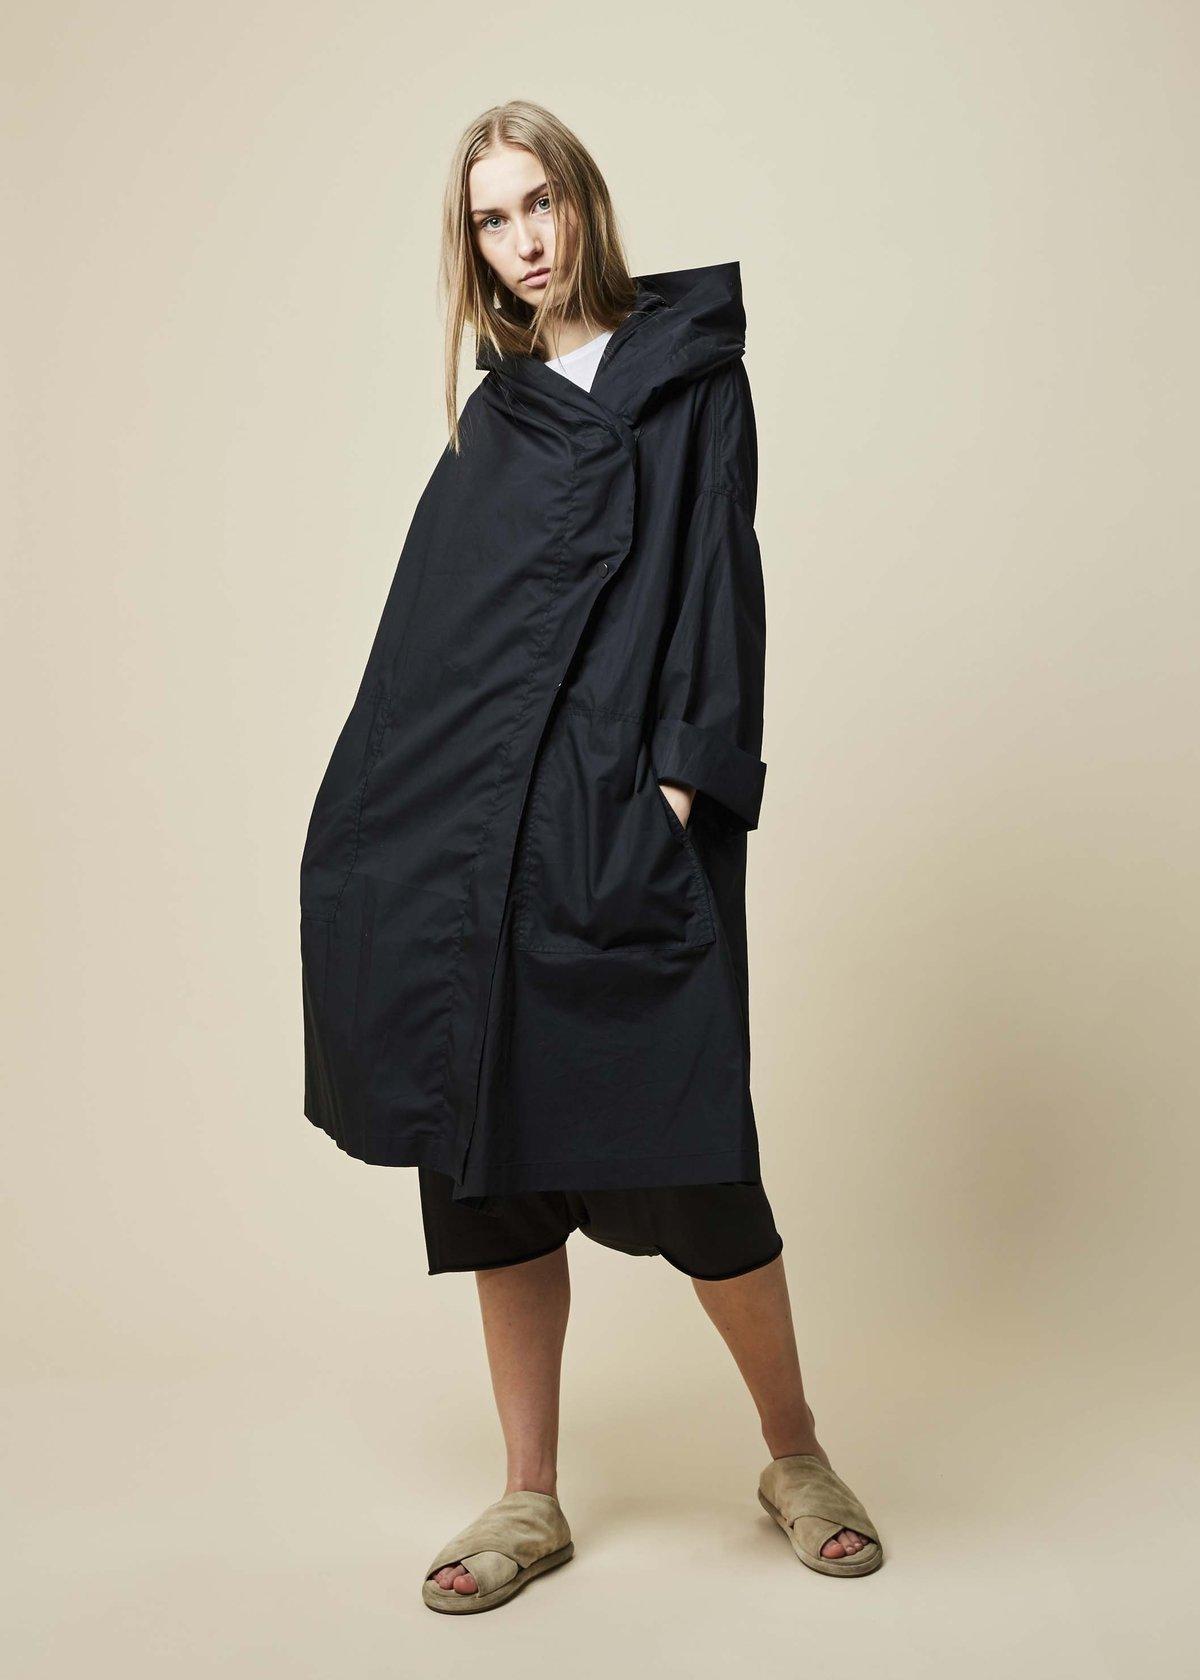 20d811ee3 Raffauf Hooded Oversize Spring Coat - Black